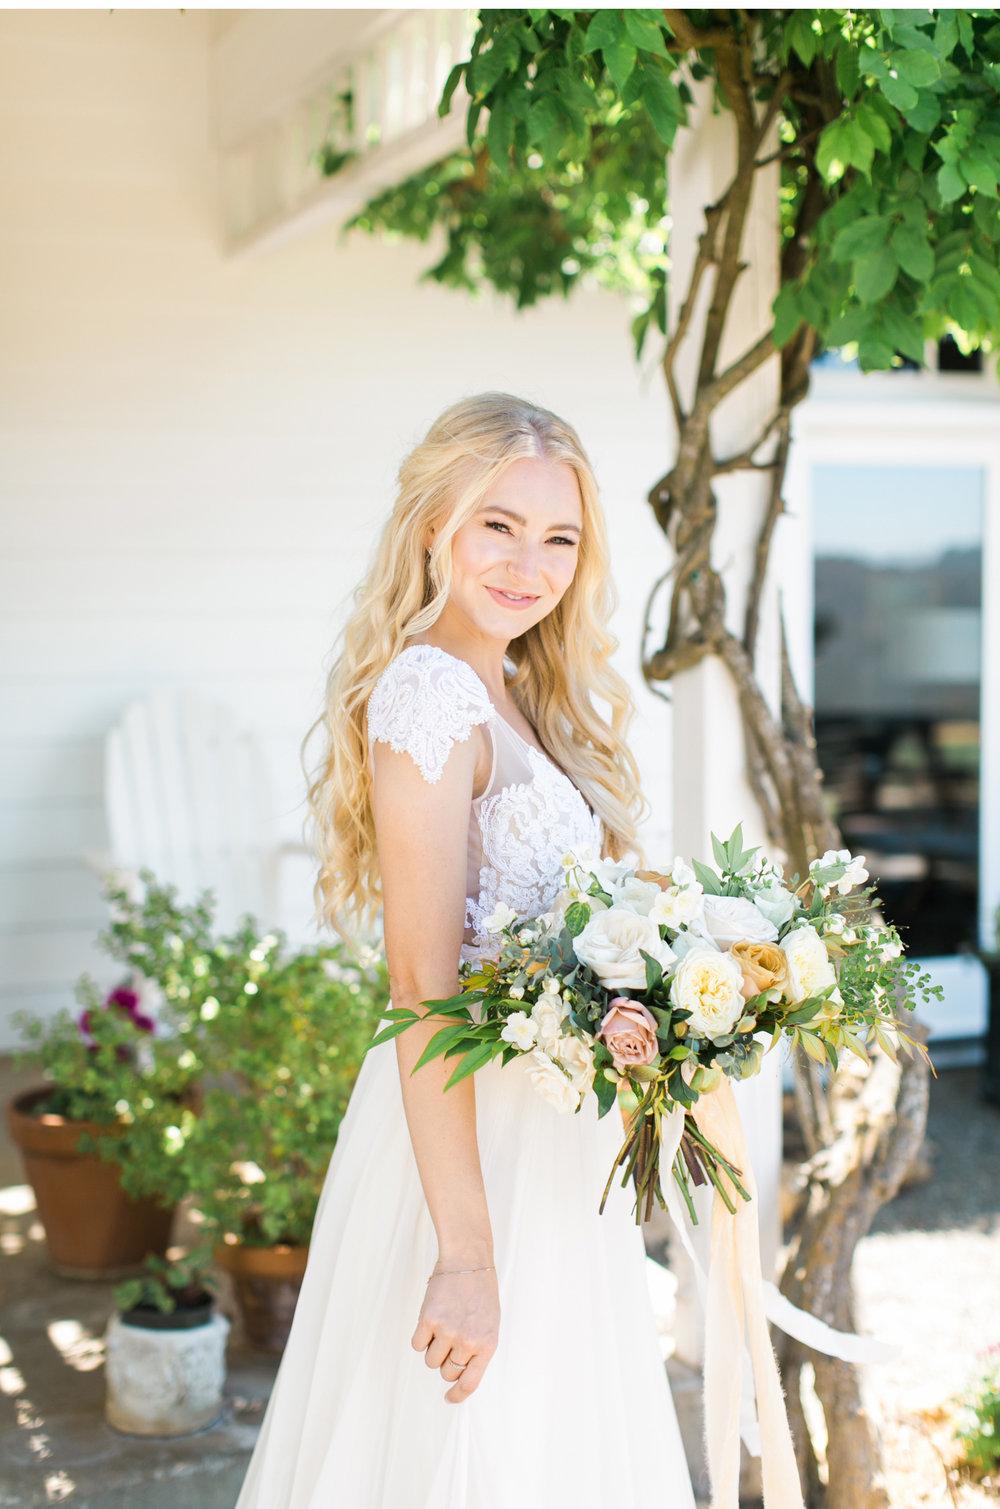 Santa-Barbara-Style-Me-Pretty-Wedding-Natalie-Schutt-Photography_13.jpg